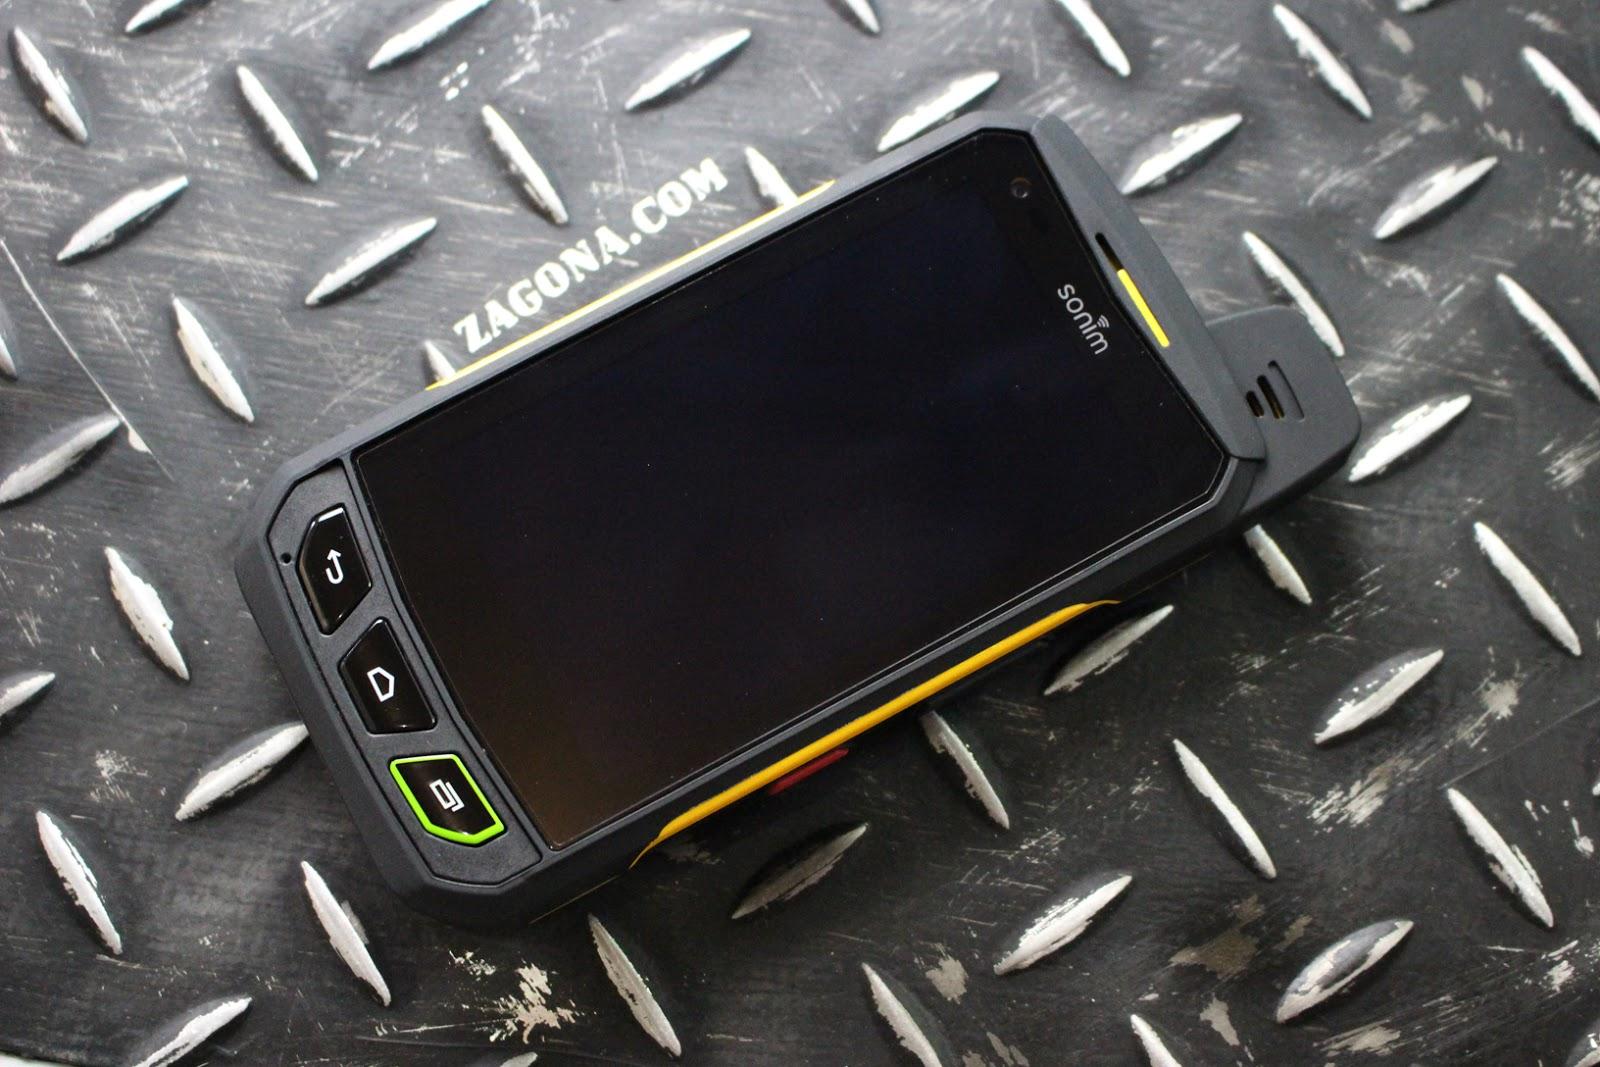 Handphone Outdoor Murah Sonim Caterpillar Hp Android Xp7 Second